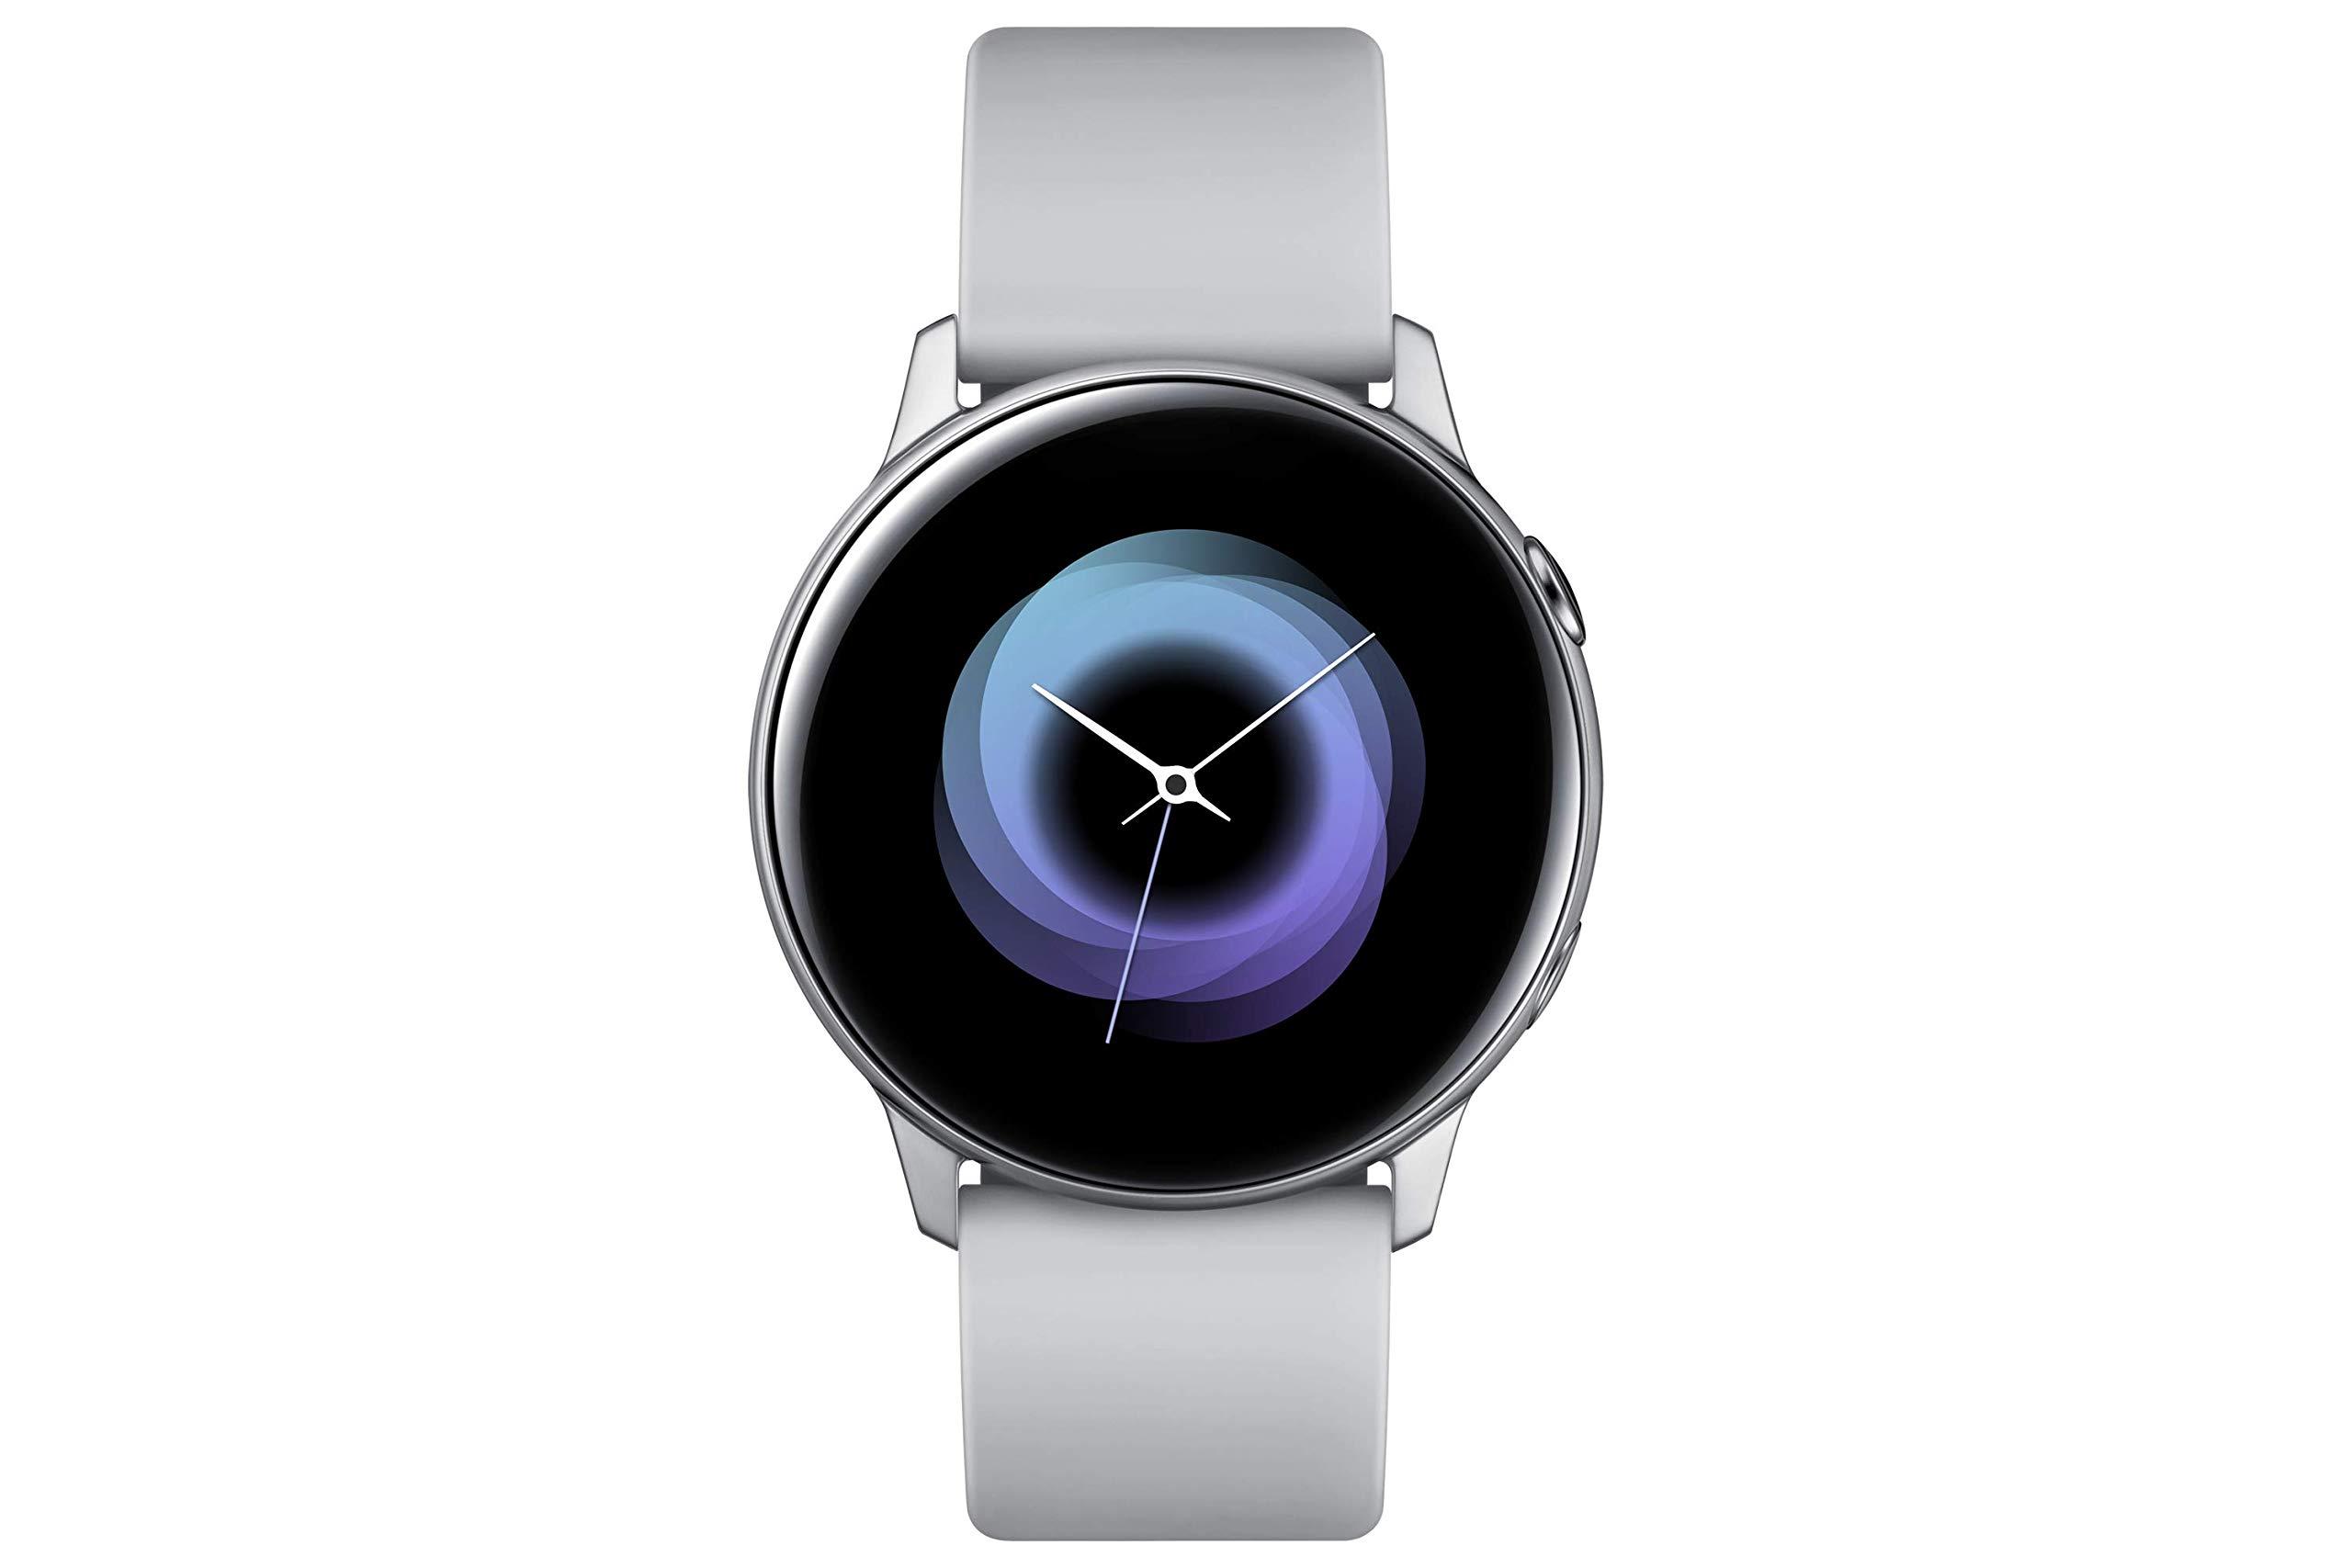 Samsung Galaxy Watch Active Reloj Inteligente Plata SAMOLED 2,79 cm (1.1″)